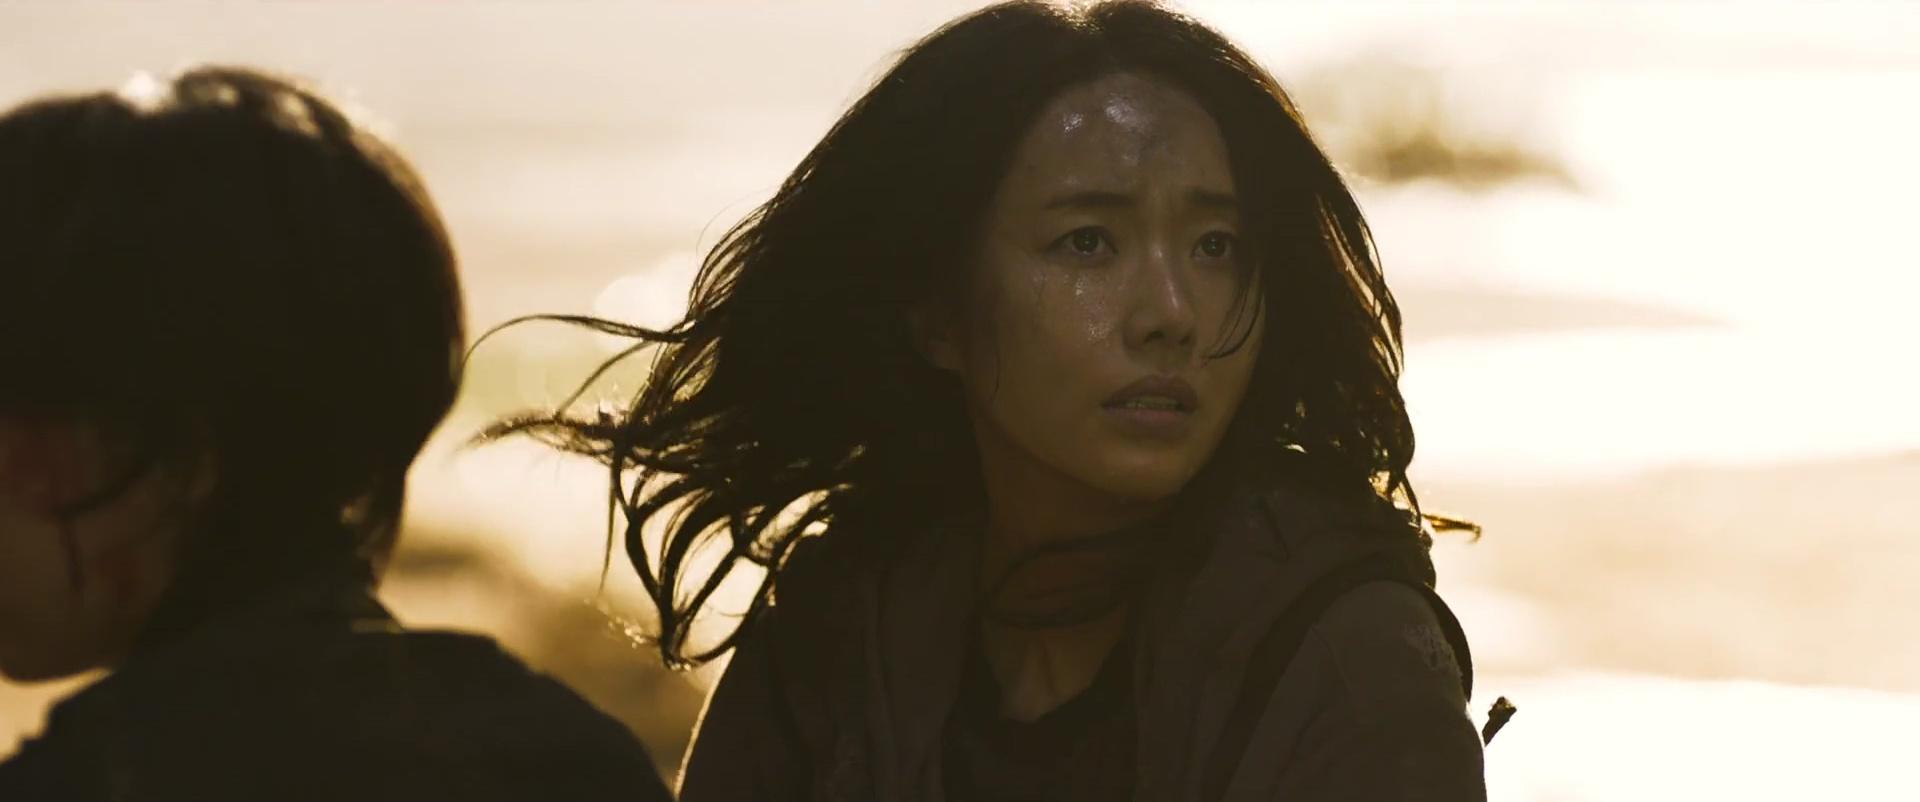 PENINSULA de Yeon Sang-ho (2020)